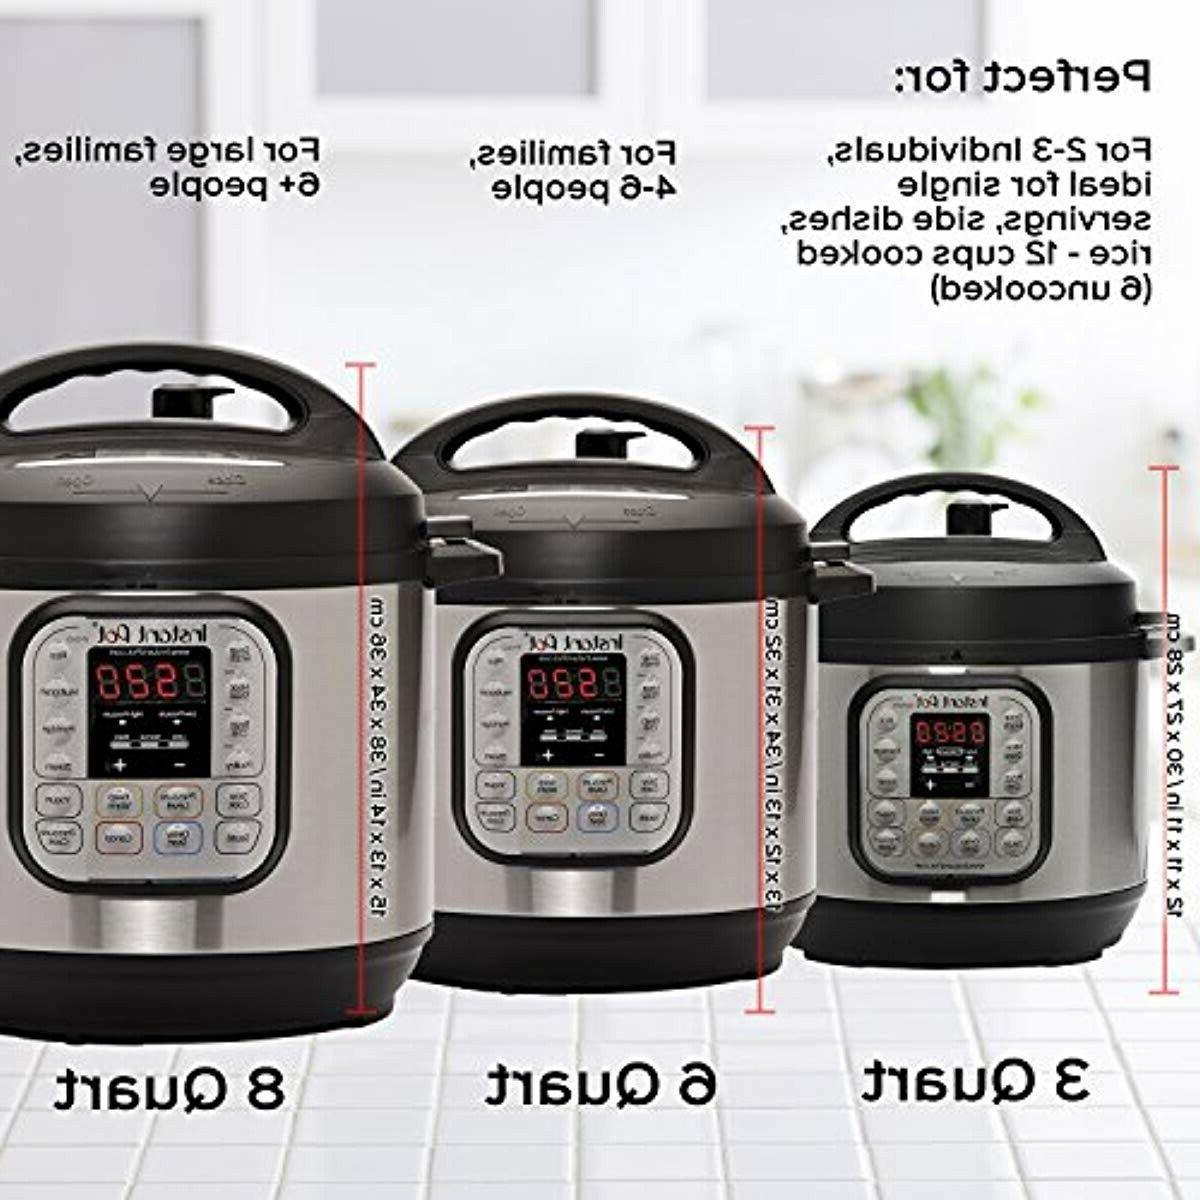 Instant Pot DUO80 3-8 Qt 7-in-1